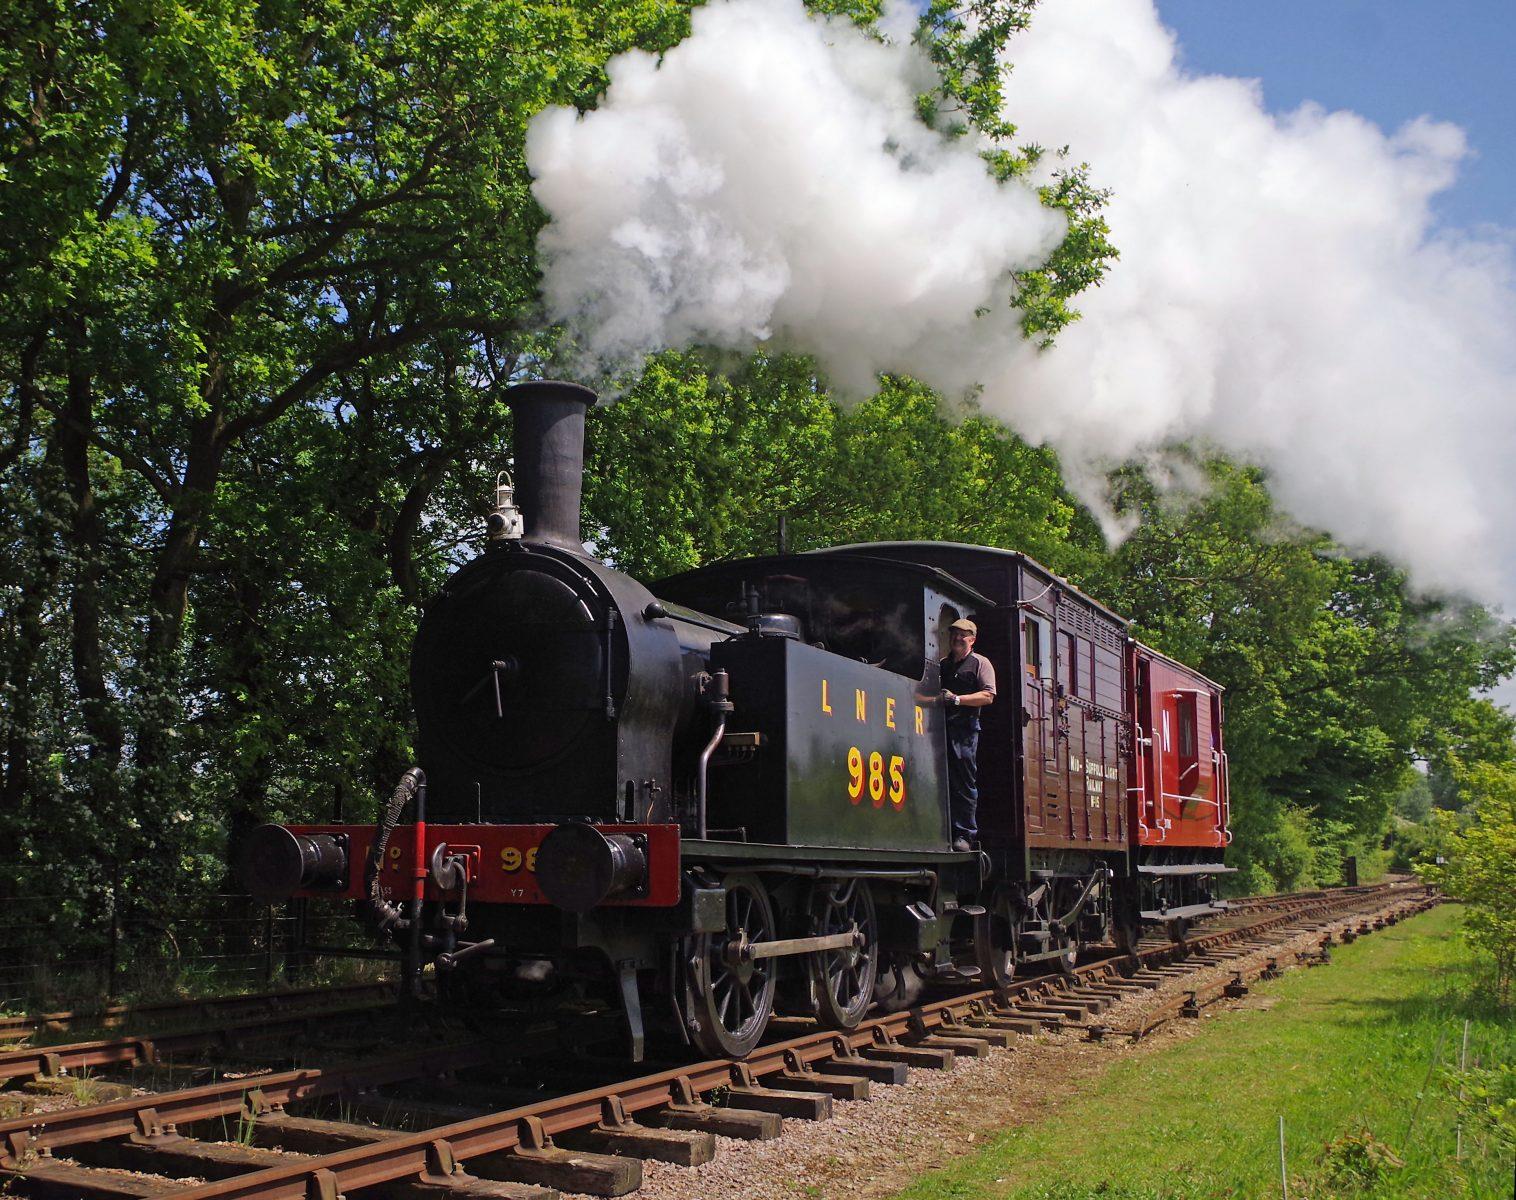 Normal steam service resumed